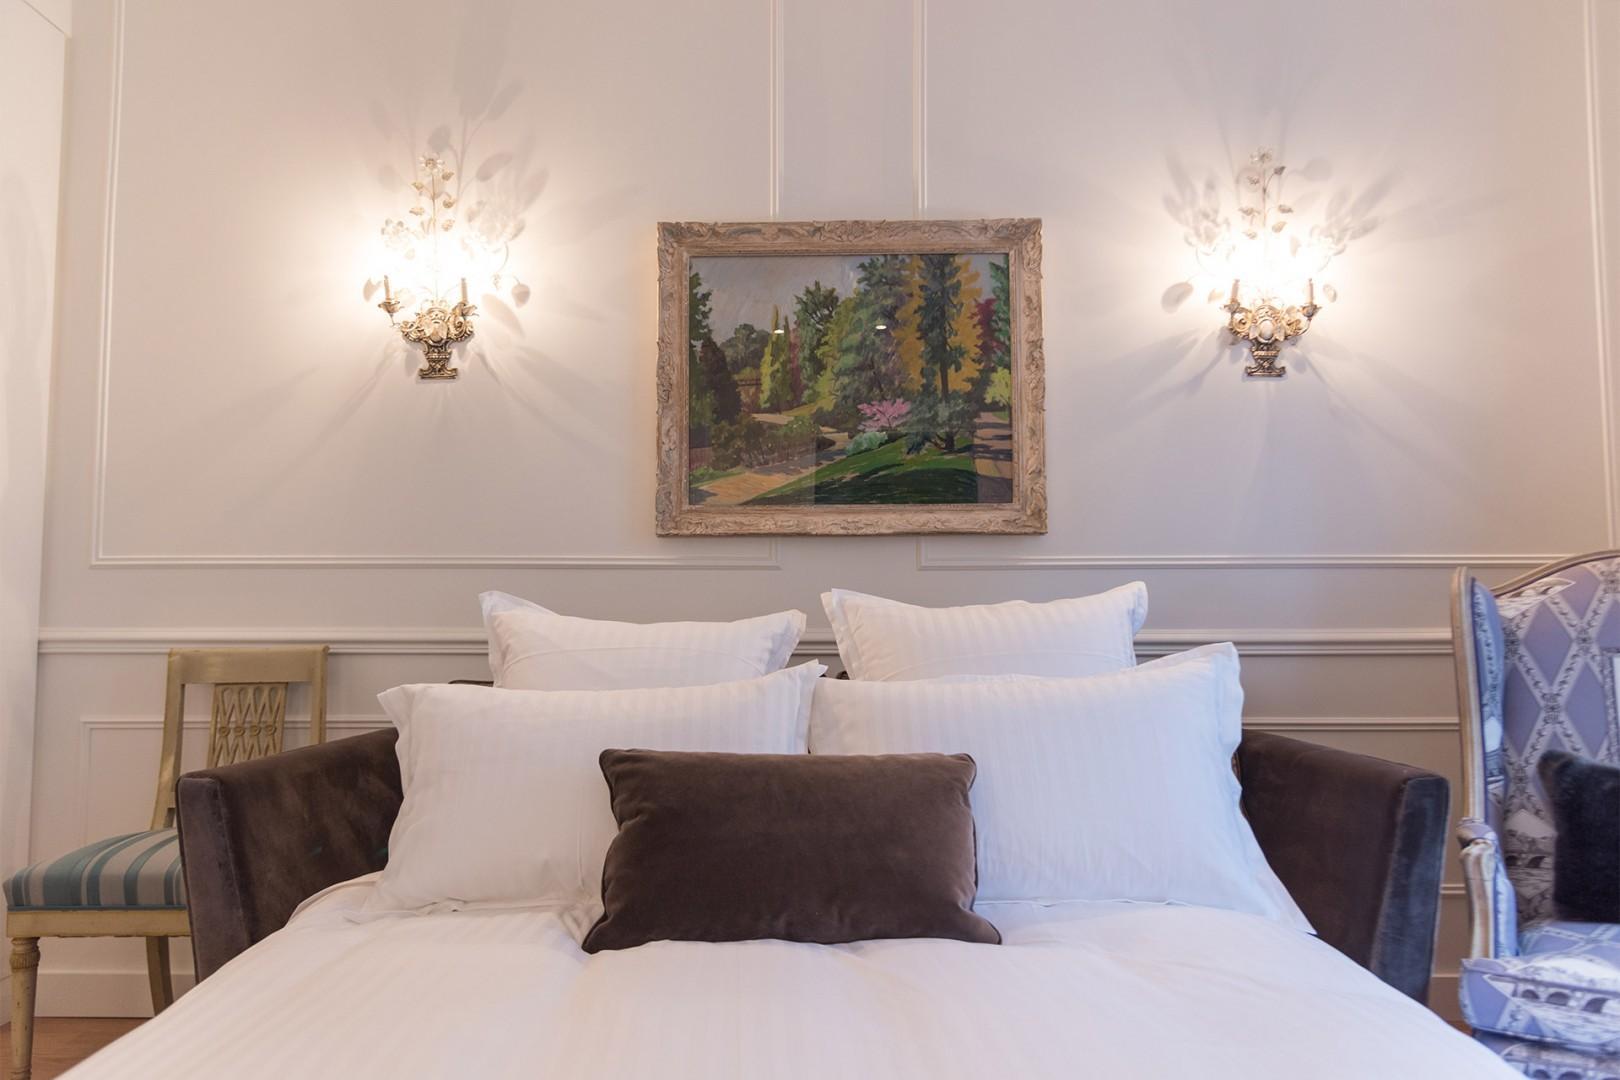 Get a good night's sleep on the high-quality sofa bed.